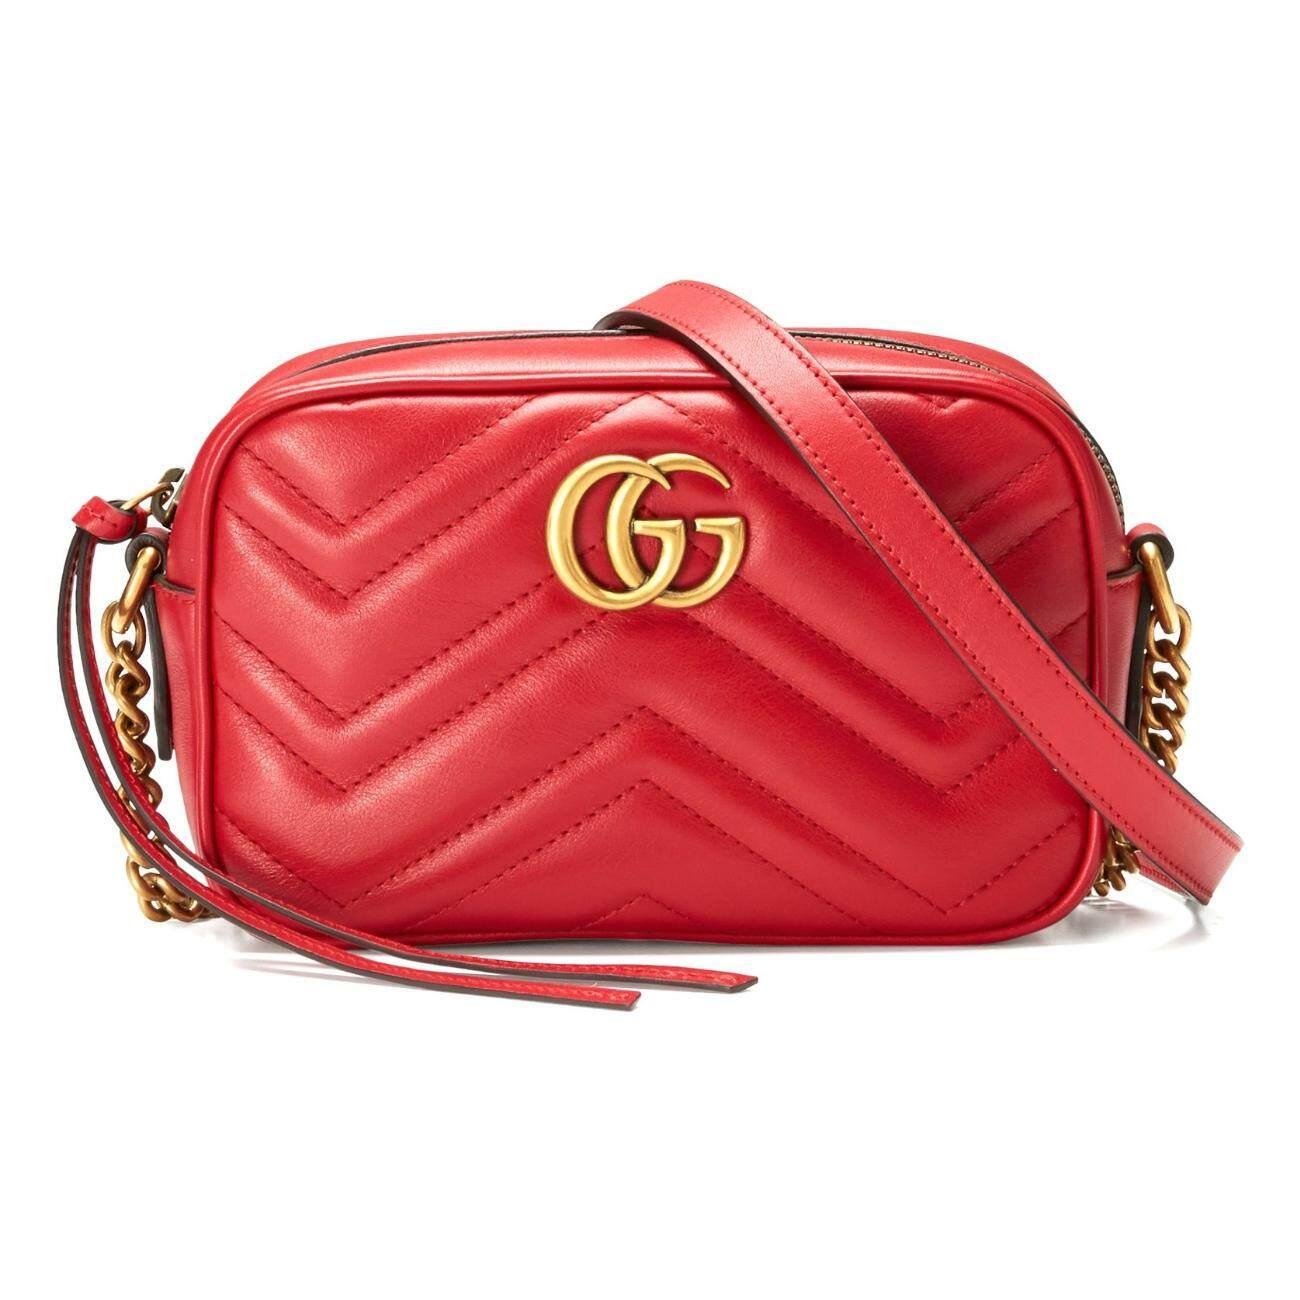 224b08408a4 Gucci 448065 DRW1T 6433 GG Marmont Matelasse Mini Crossbody Bag